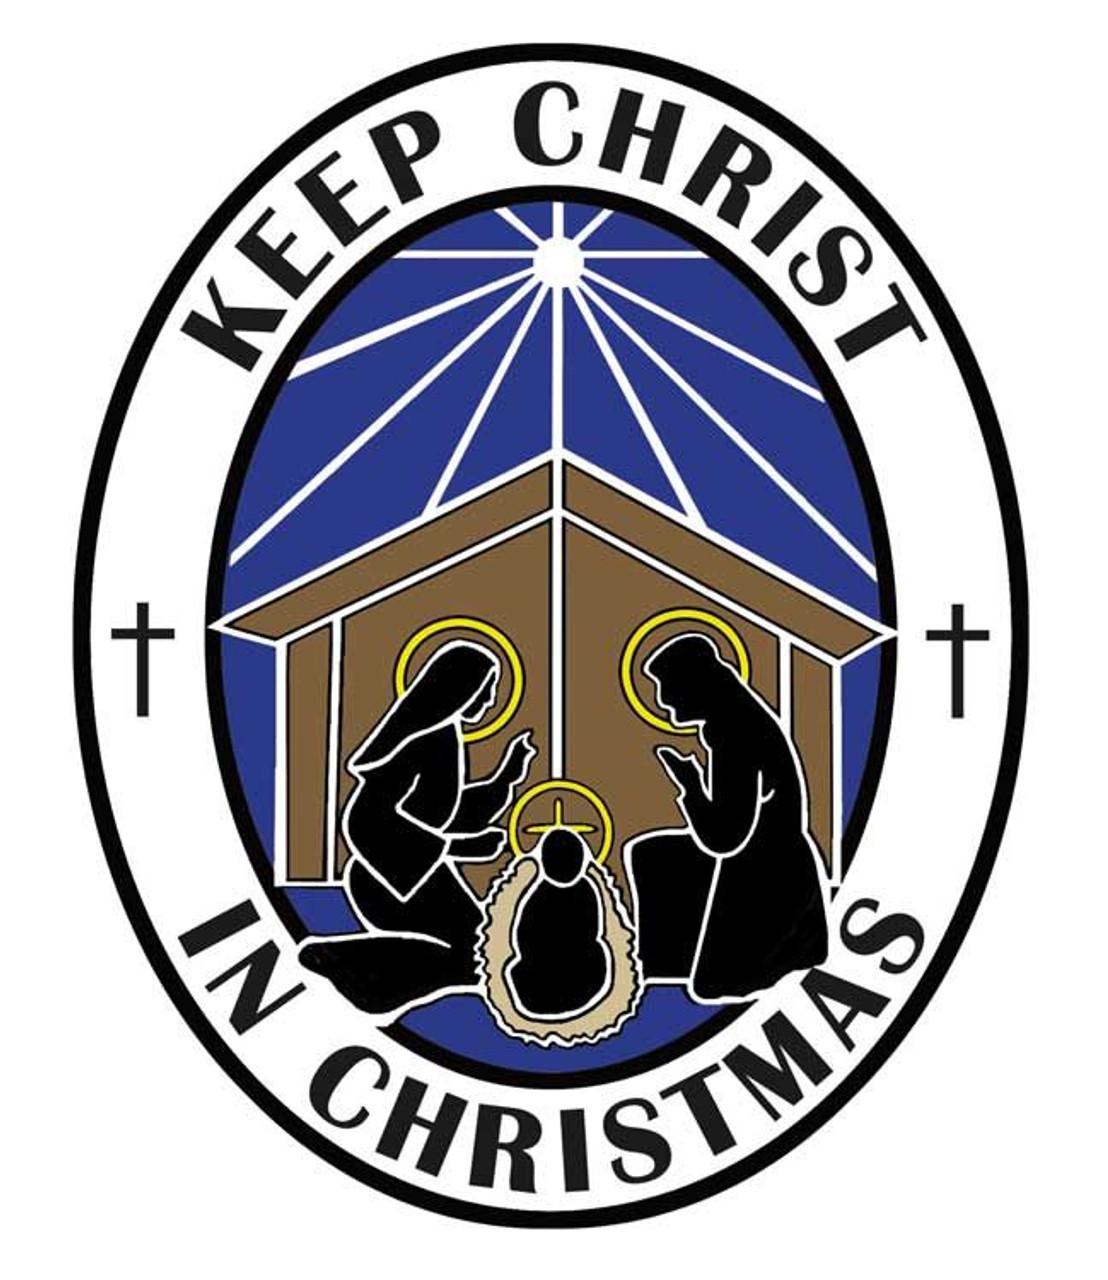 Keep Christ in Christmas Car Magnet Style DV18245 - F.C. Ziegler Company